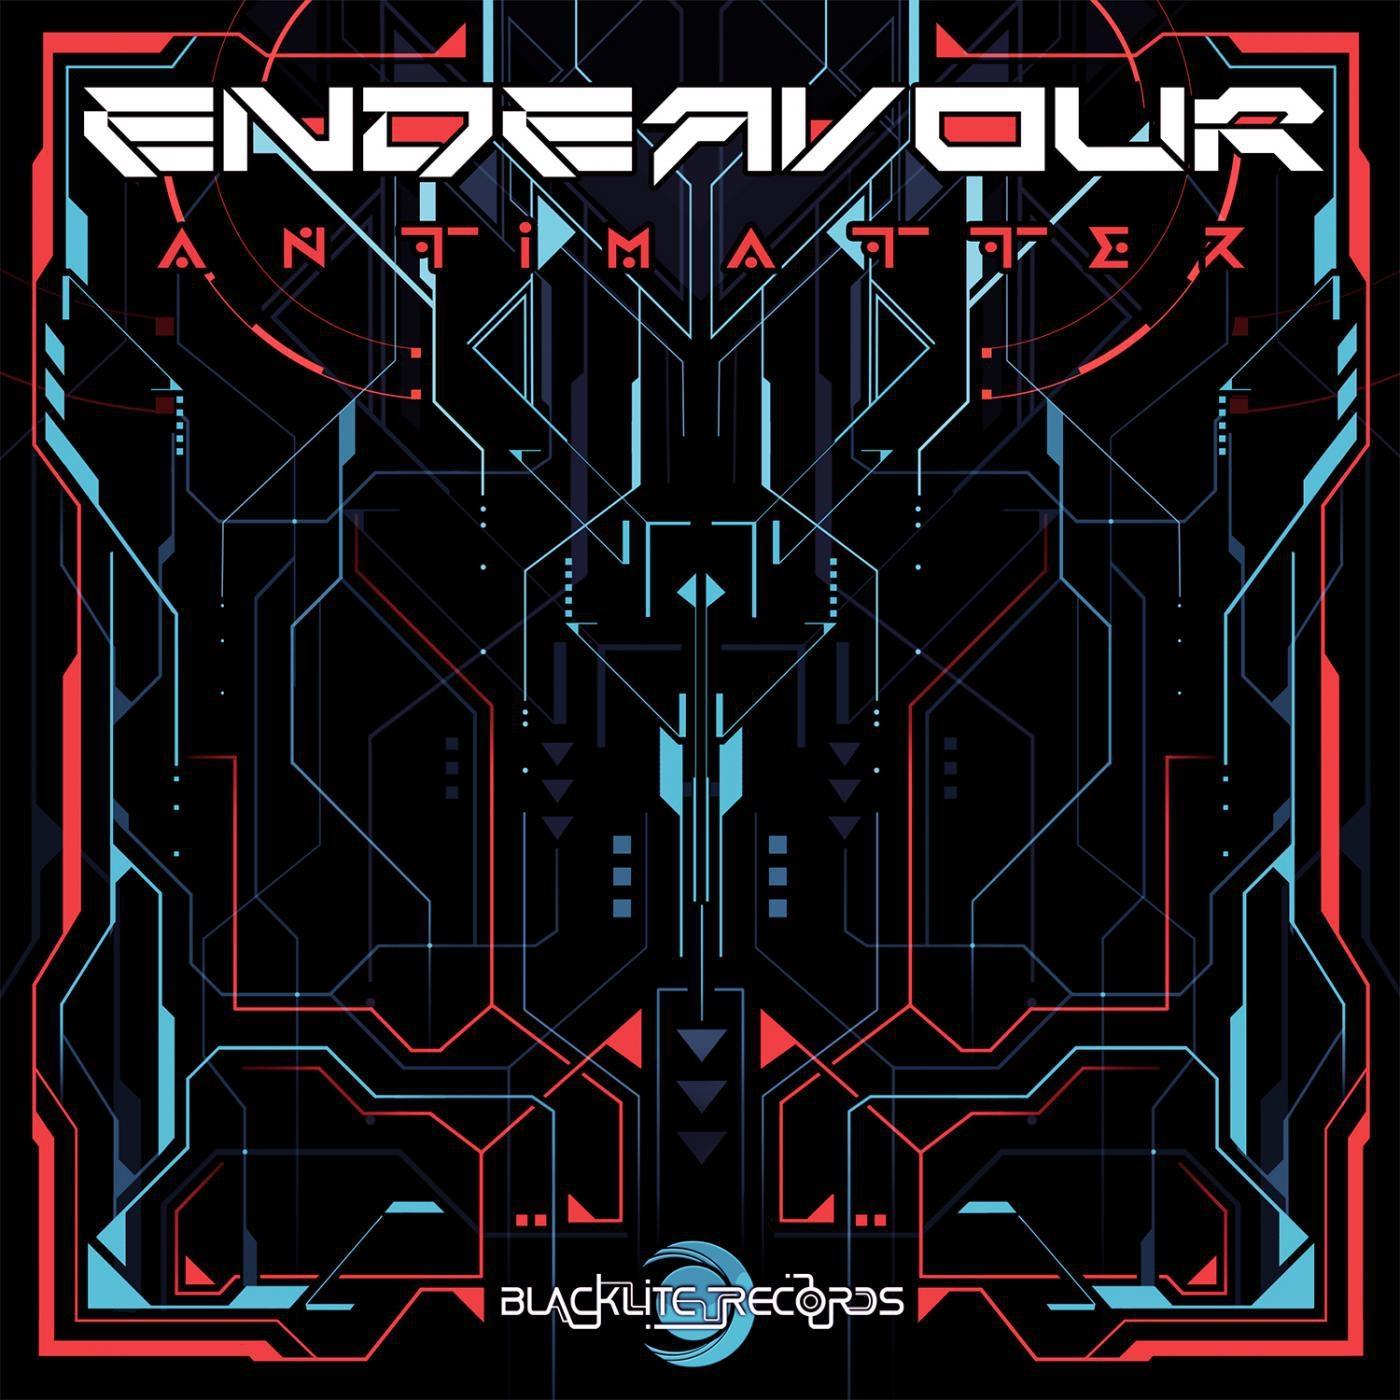 Endeavour - Trend Modder (Original mix)